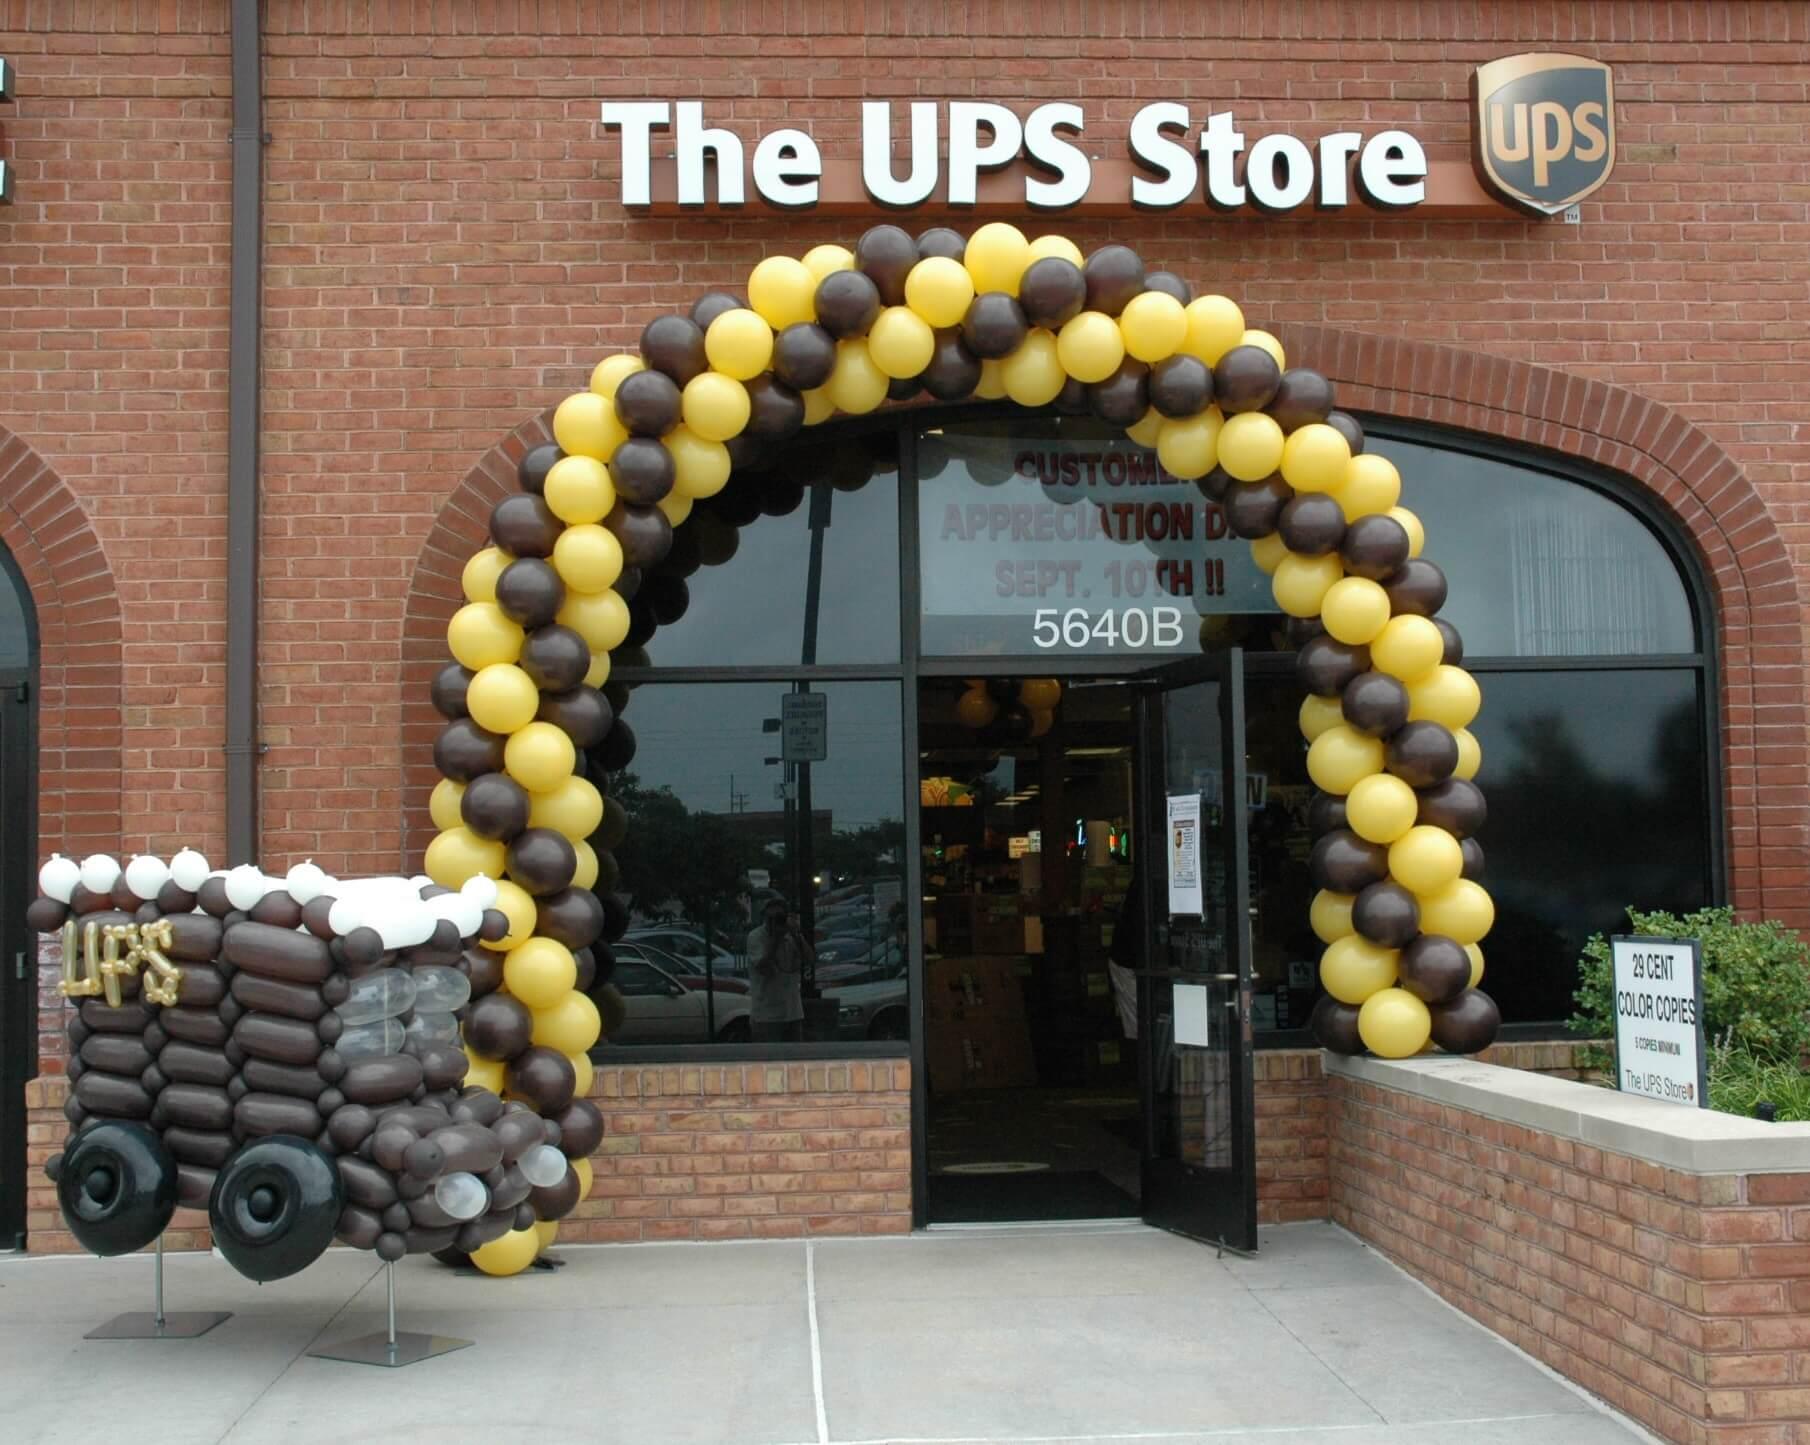 SAMMY J Balloon Creations st louis balloons ups arch